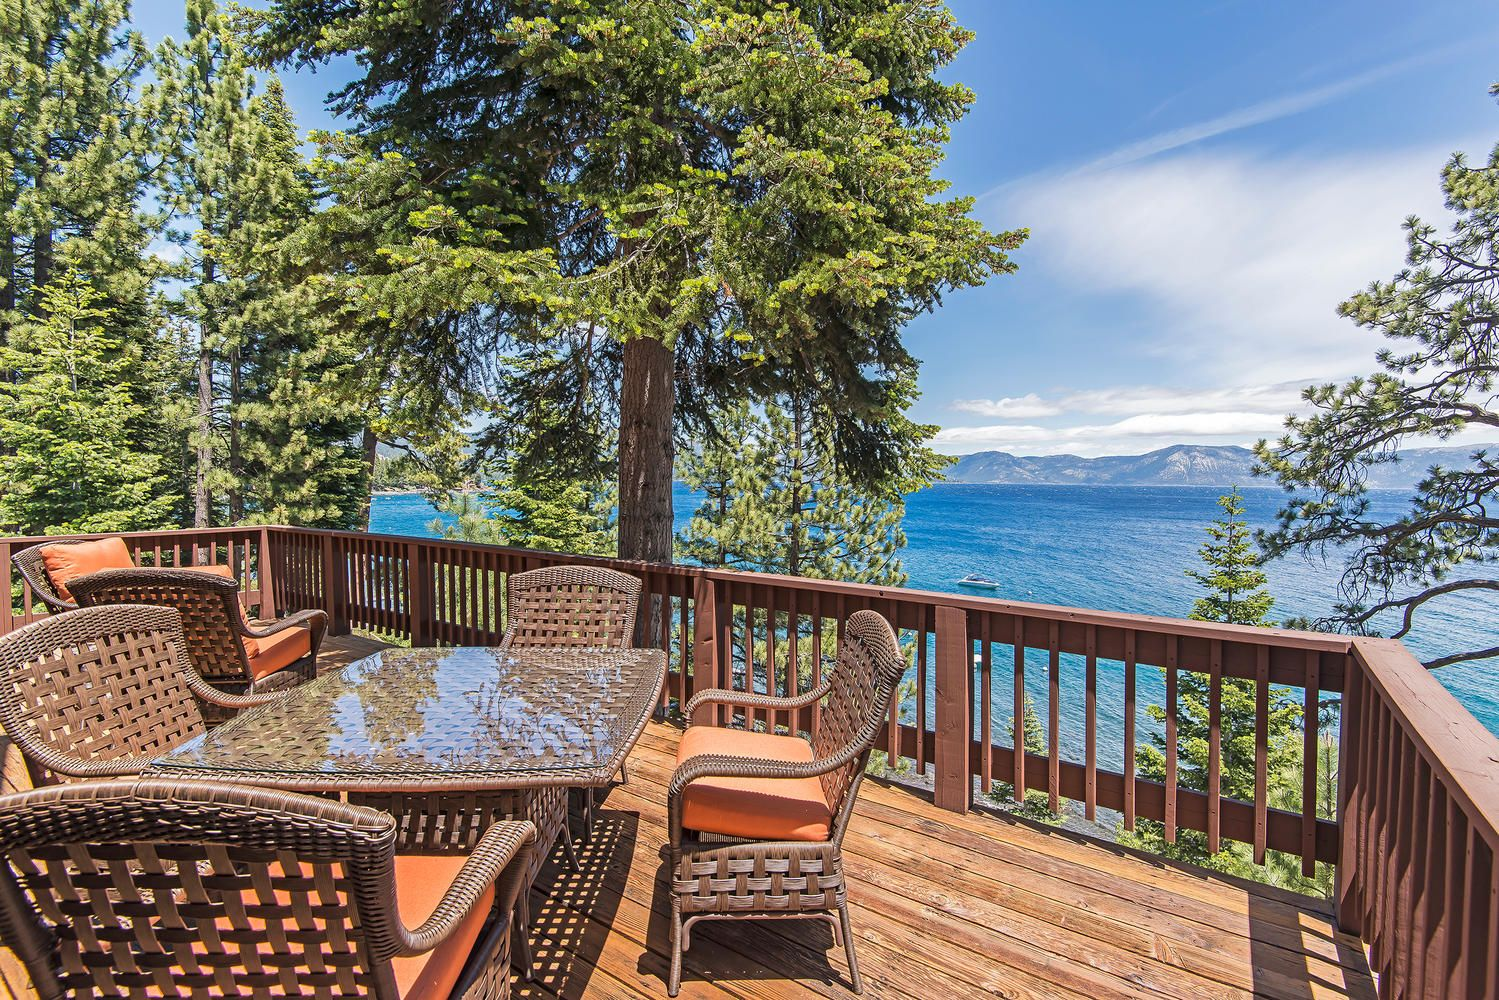 Lake Tahoe Vacation Rentals | Glimmering Shores Lake Front